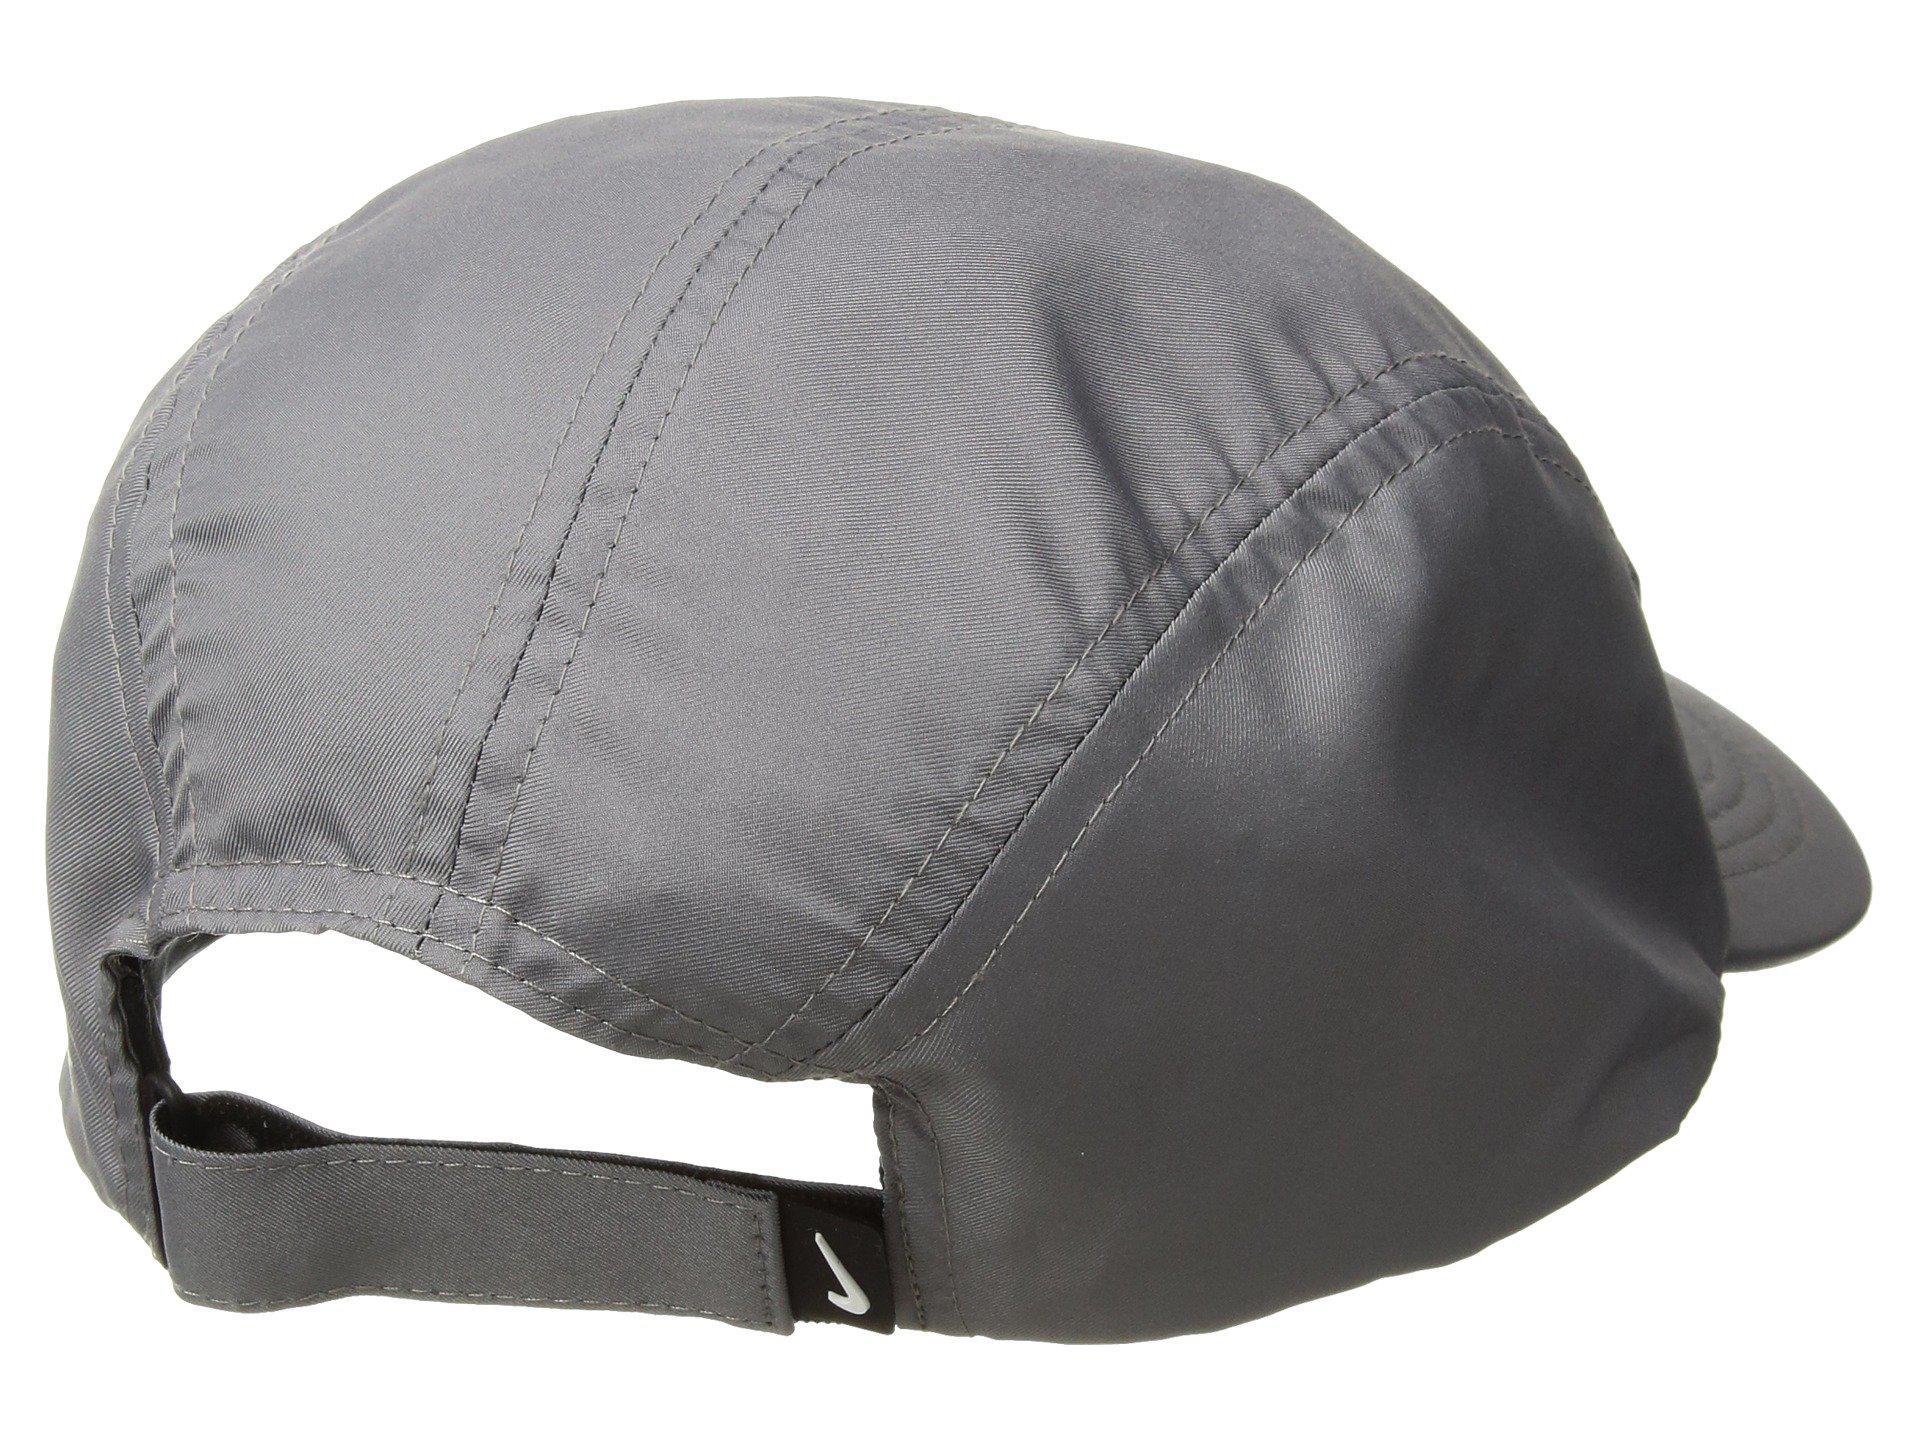 Lyst - Nike Aw84 Core Cap in Gray for Men db6df57b746